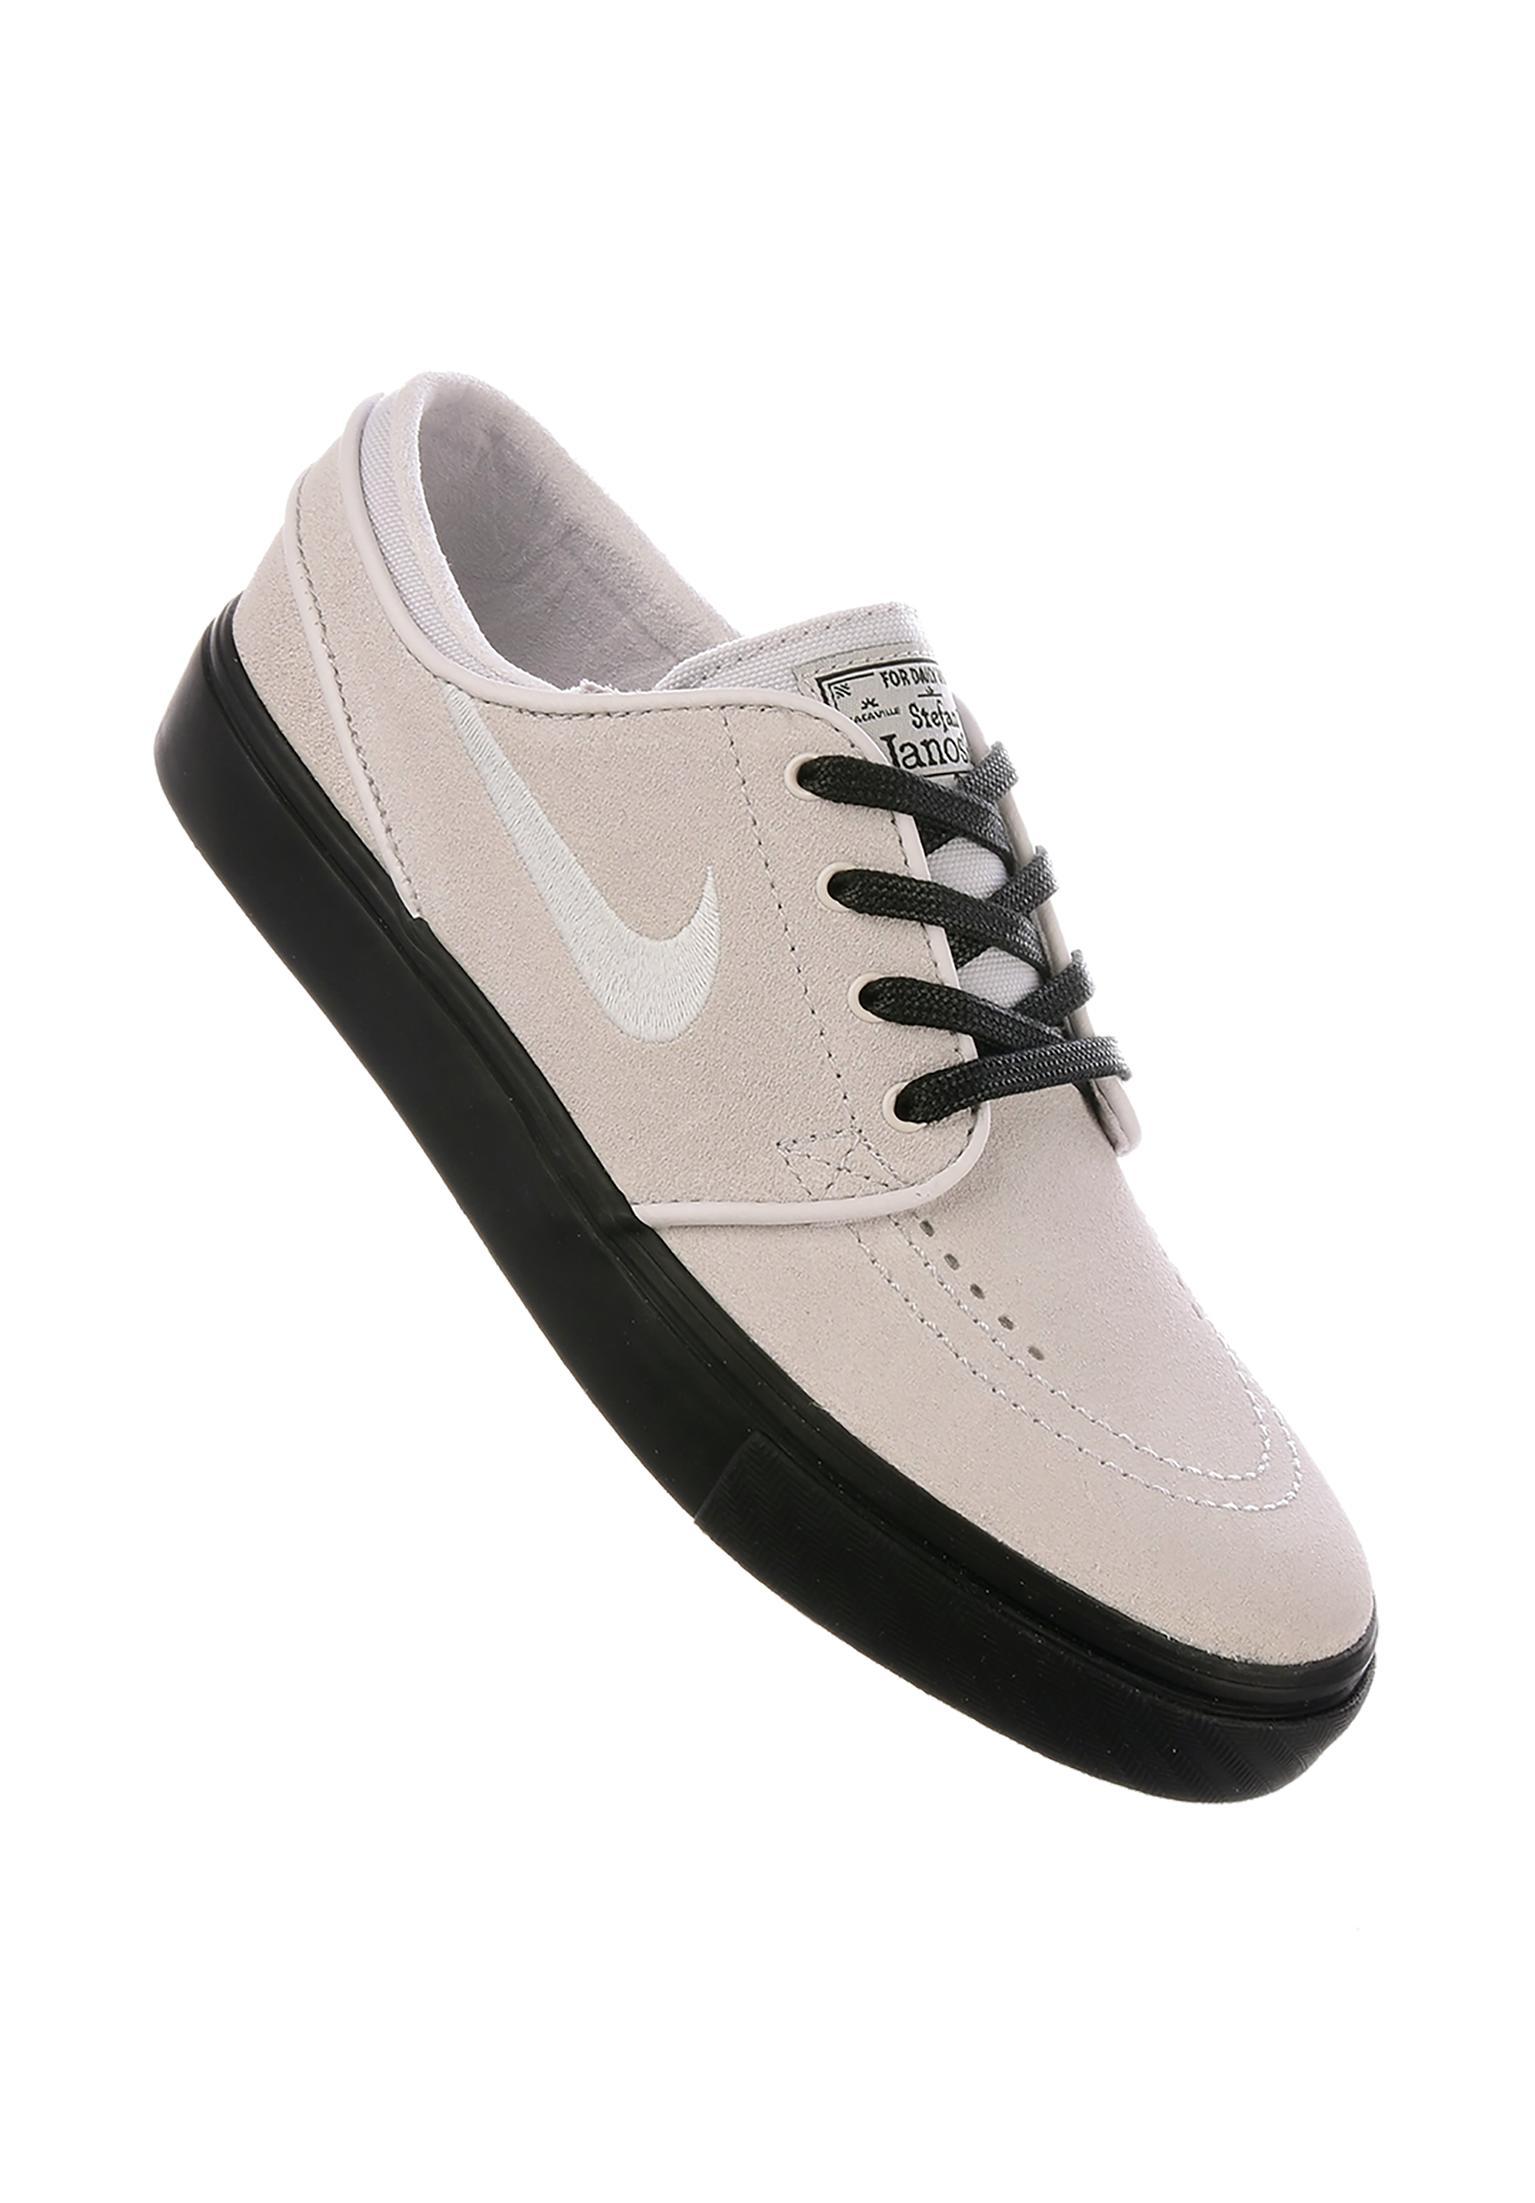 Zoom Stefan Janoski Wmn Nike SB Alle Schoenen in vastgrey-black voor Dames   07aa701b4